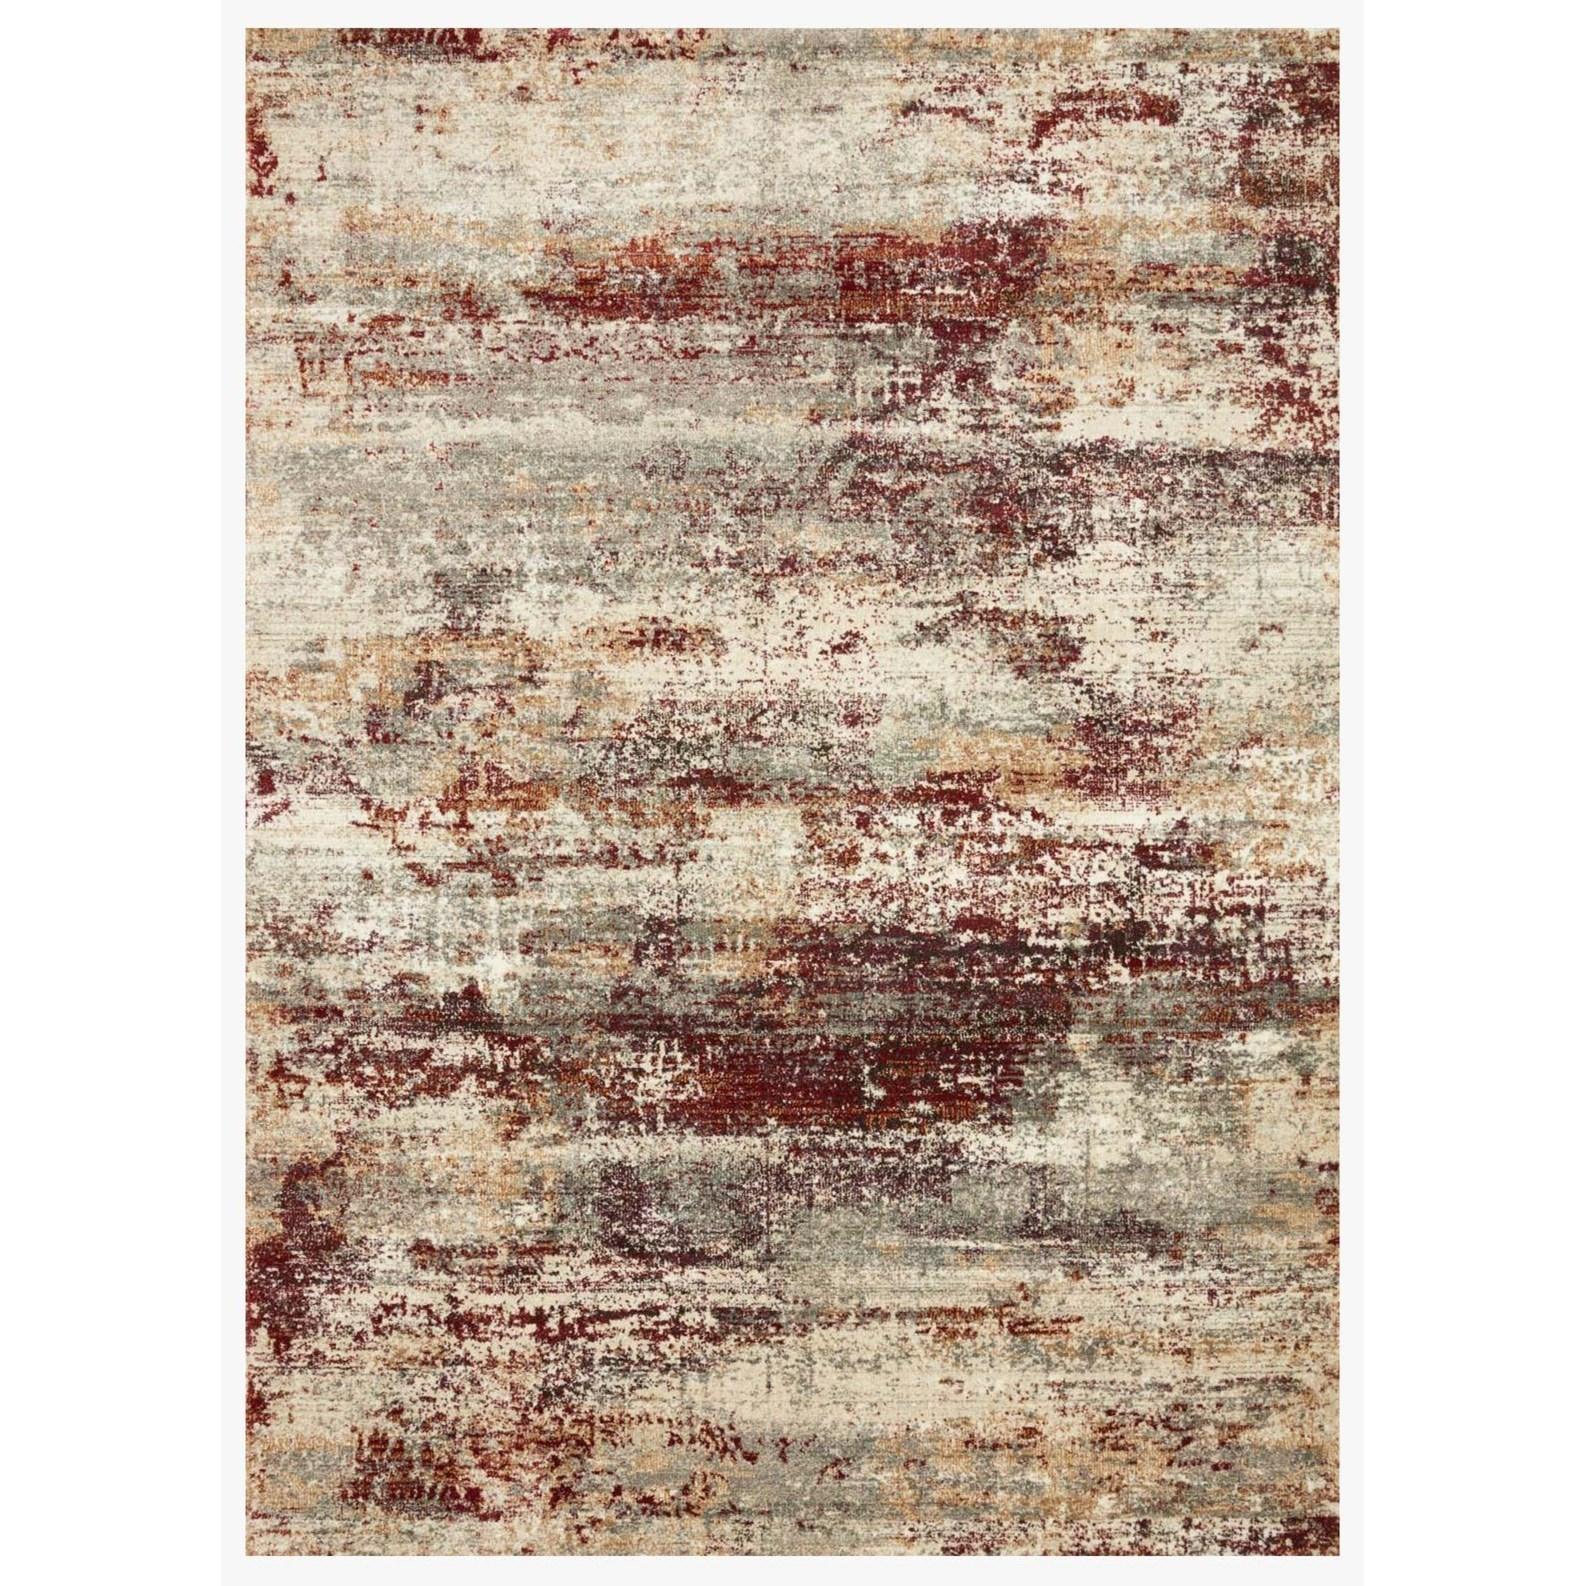 "Jasmine 11'6"" x 15' Dove / Rust Rug by Loloi Rugs at Virginia Furniture Market"